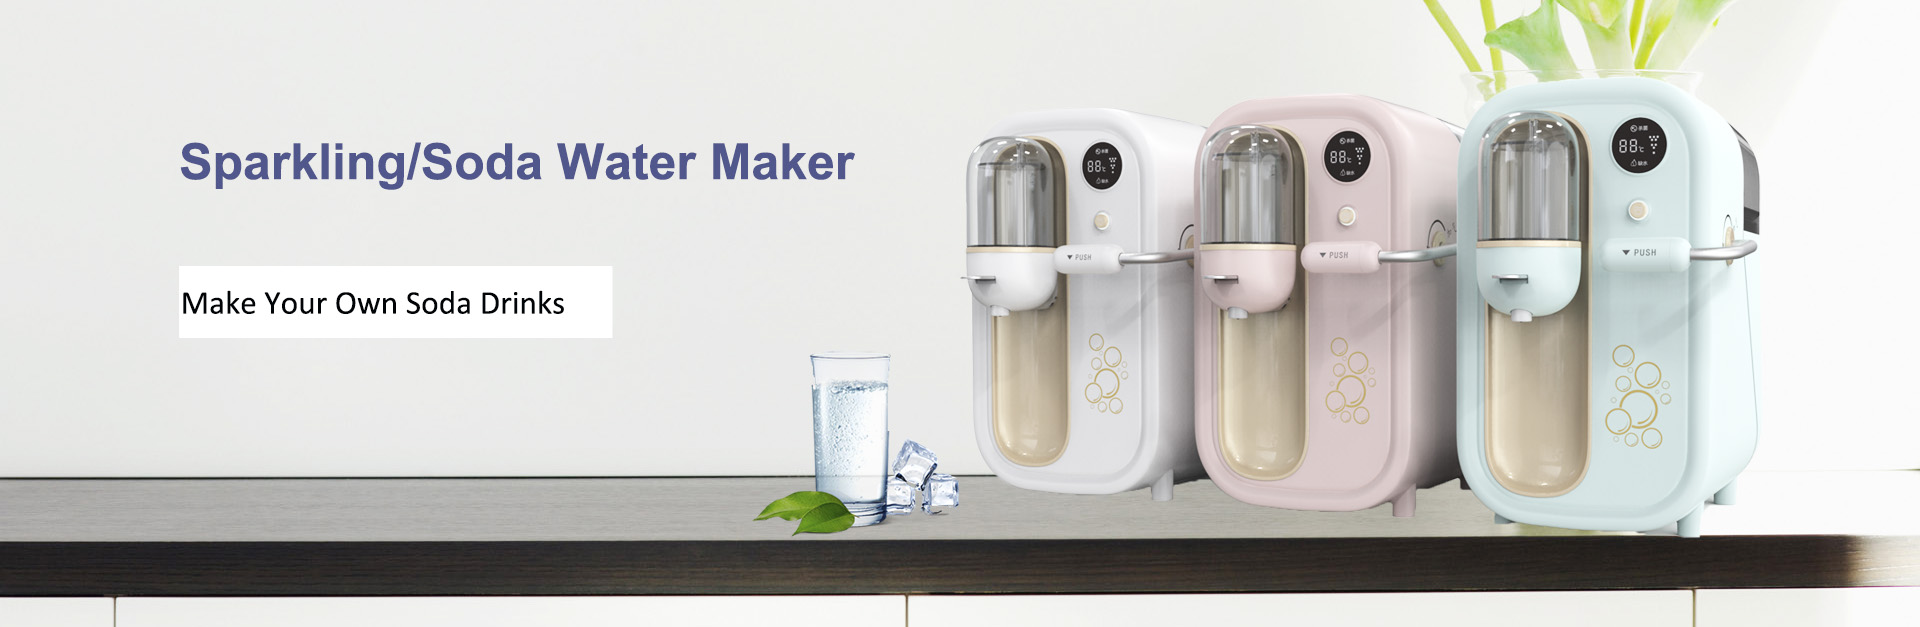 Sparkling Soda Water Maker